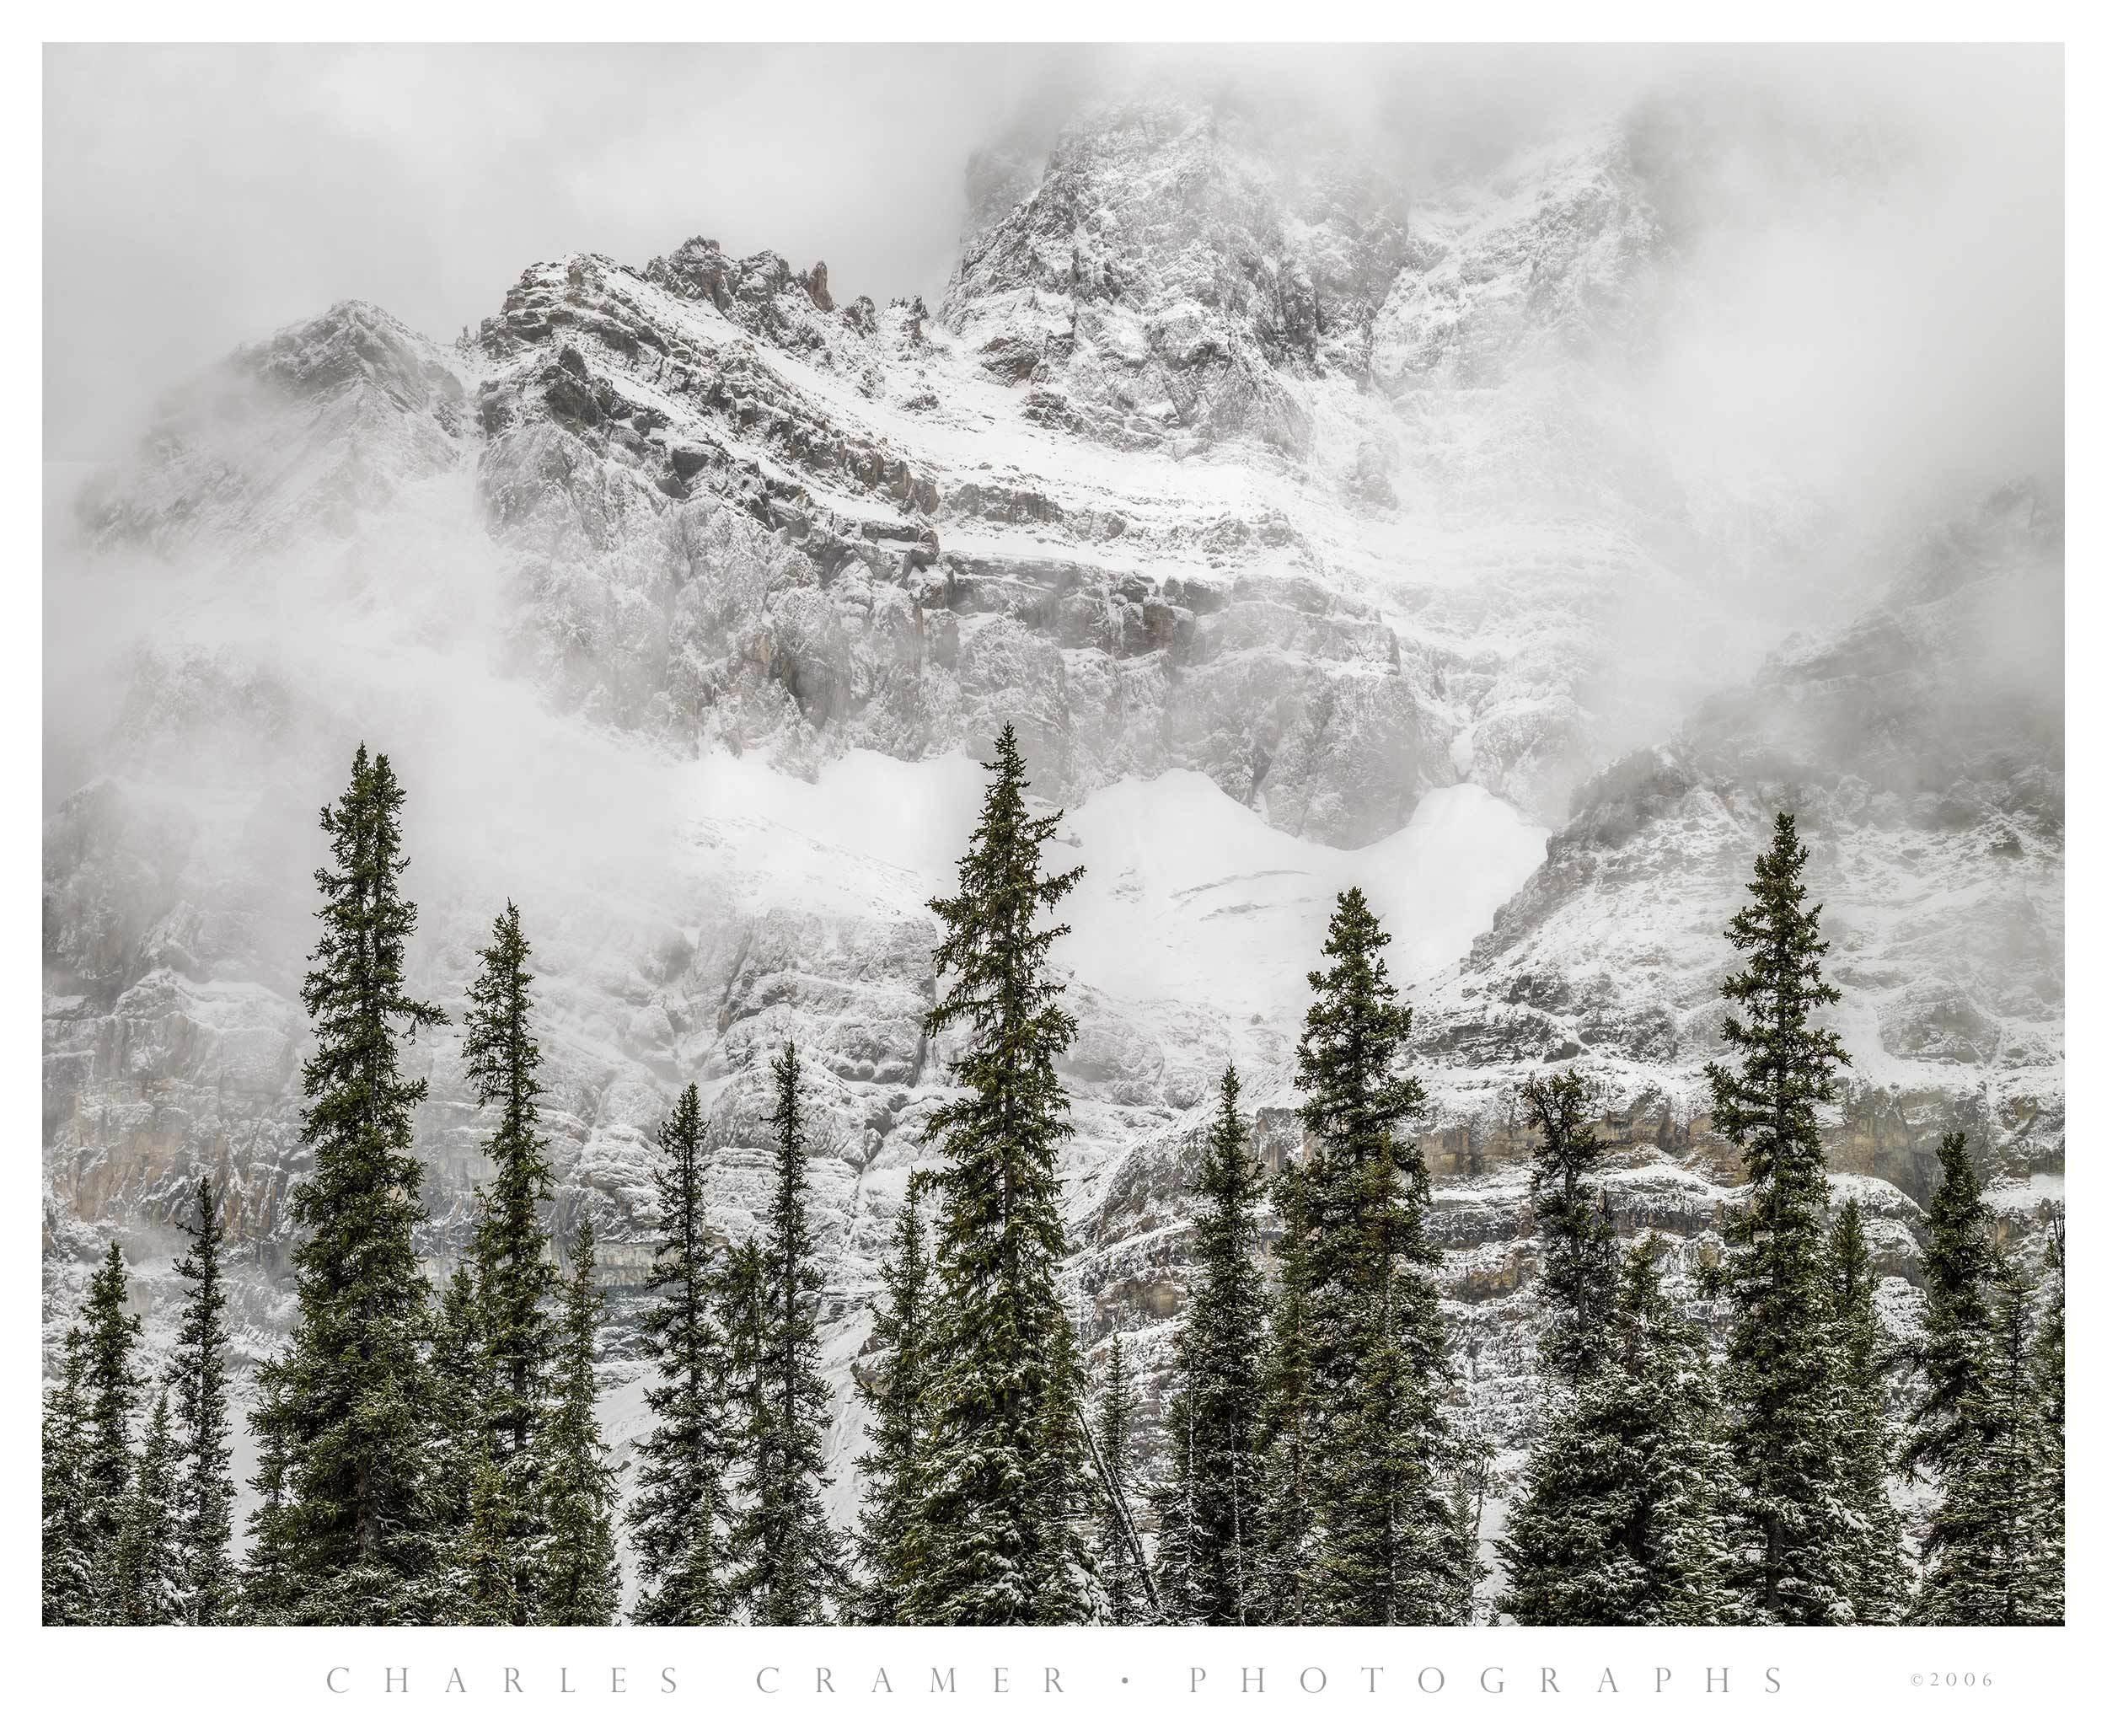 Misty Peaks, Canadian Rockies, Snowstorm